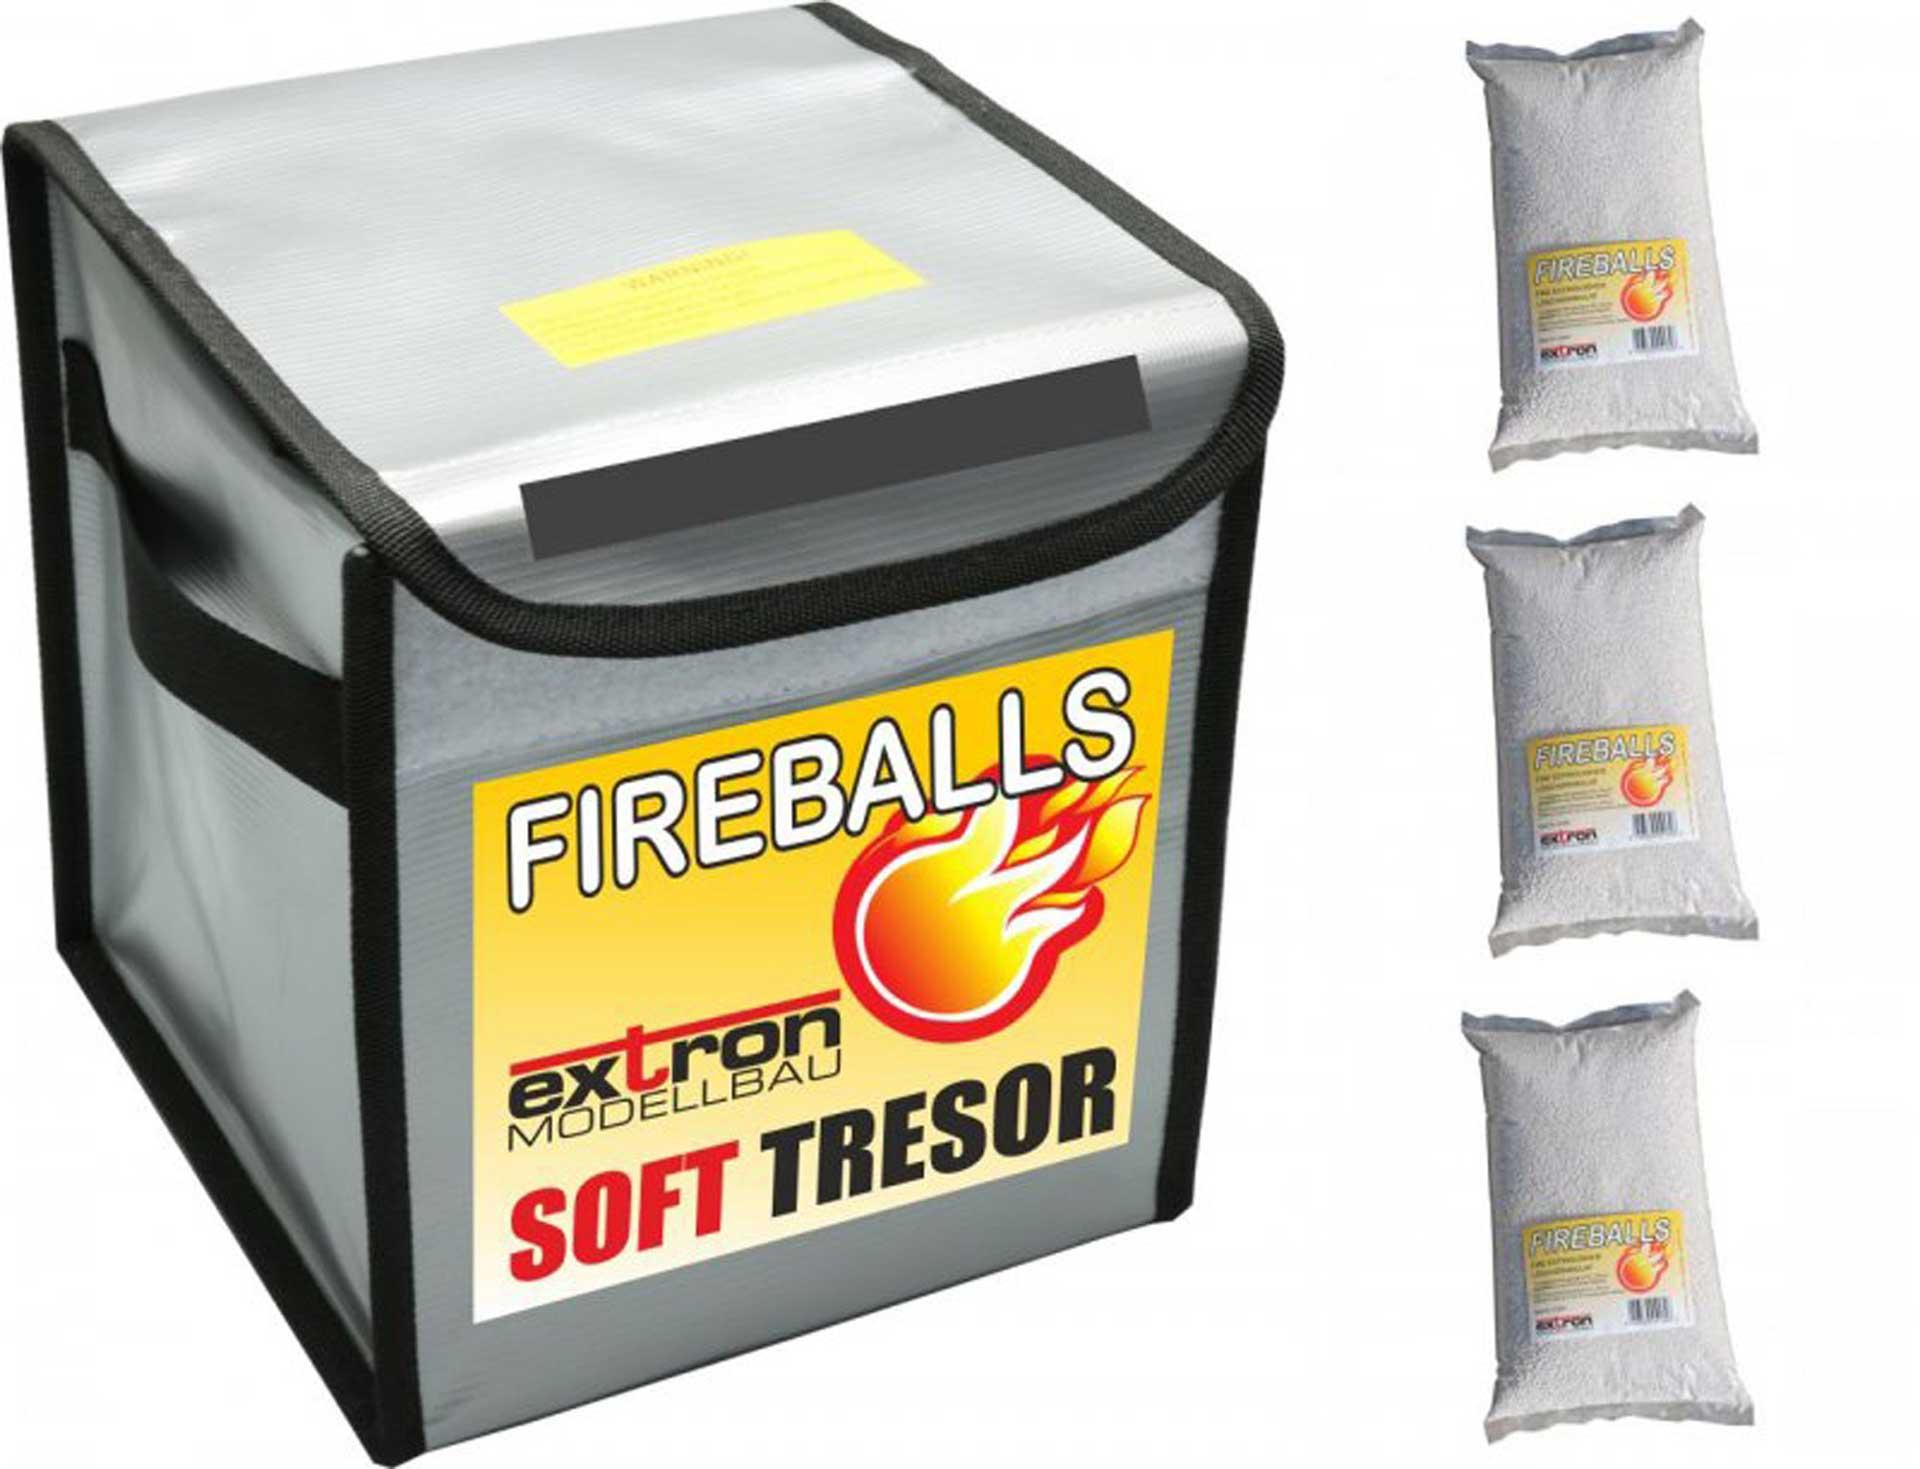 EXTRON FIREBALLS SOFT TRESOR INKL. 3 X 1 LITER